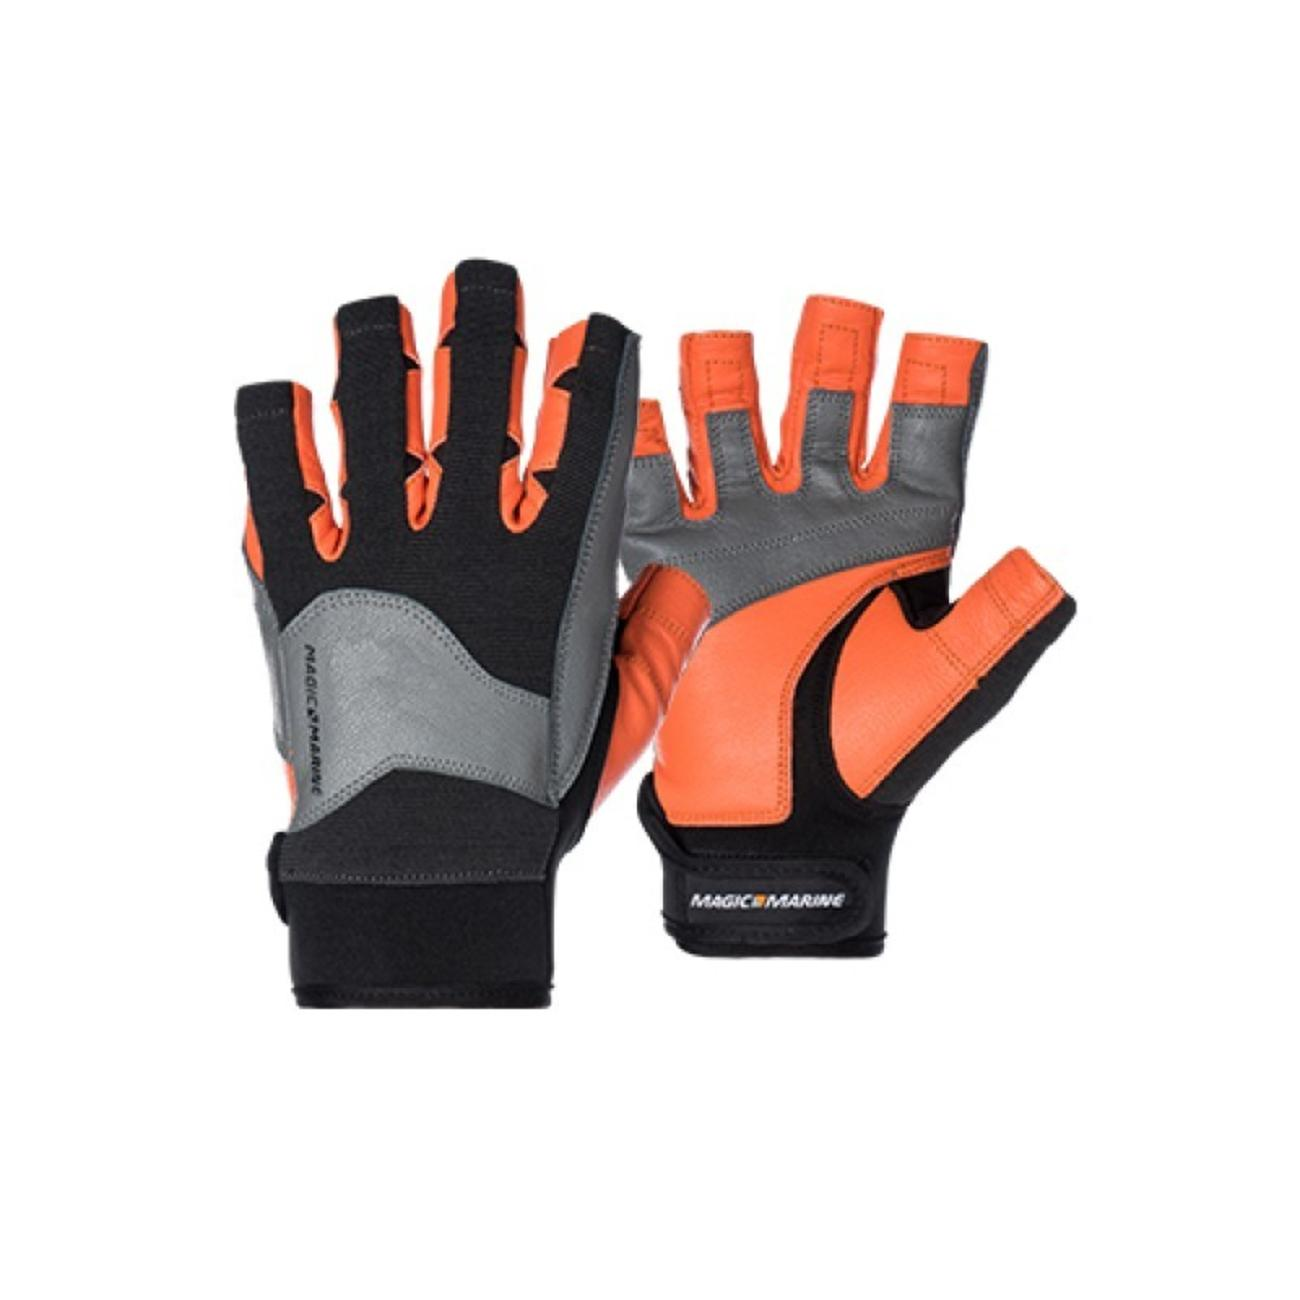 Frixion Gloves S/F レザーグローブ ショートフィンガー